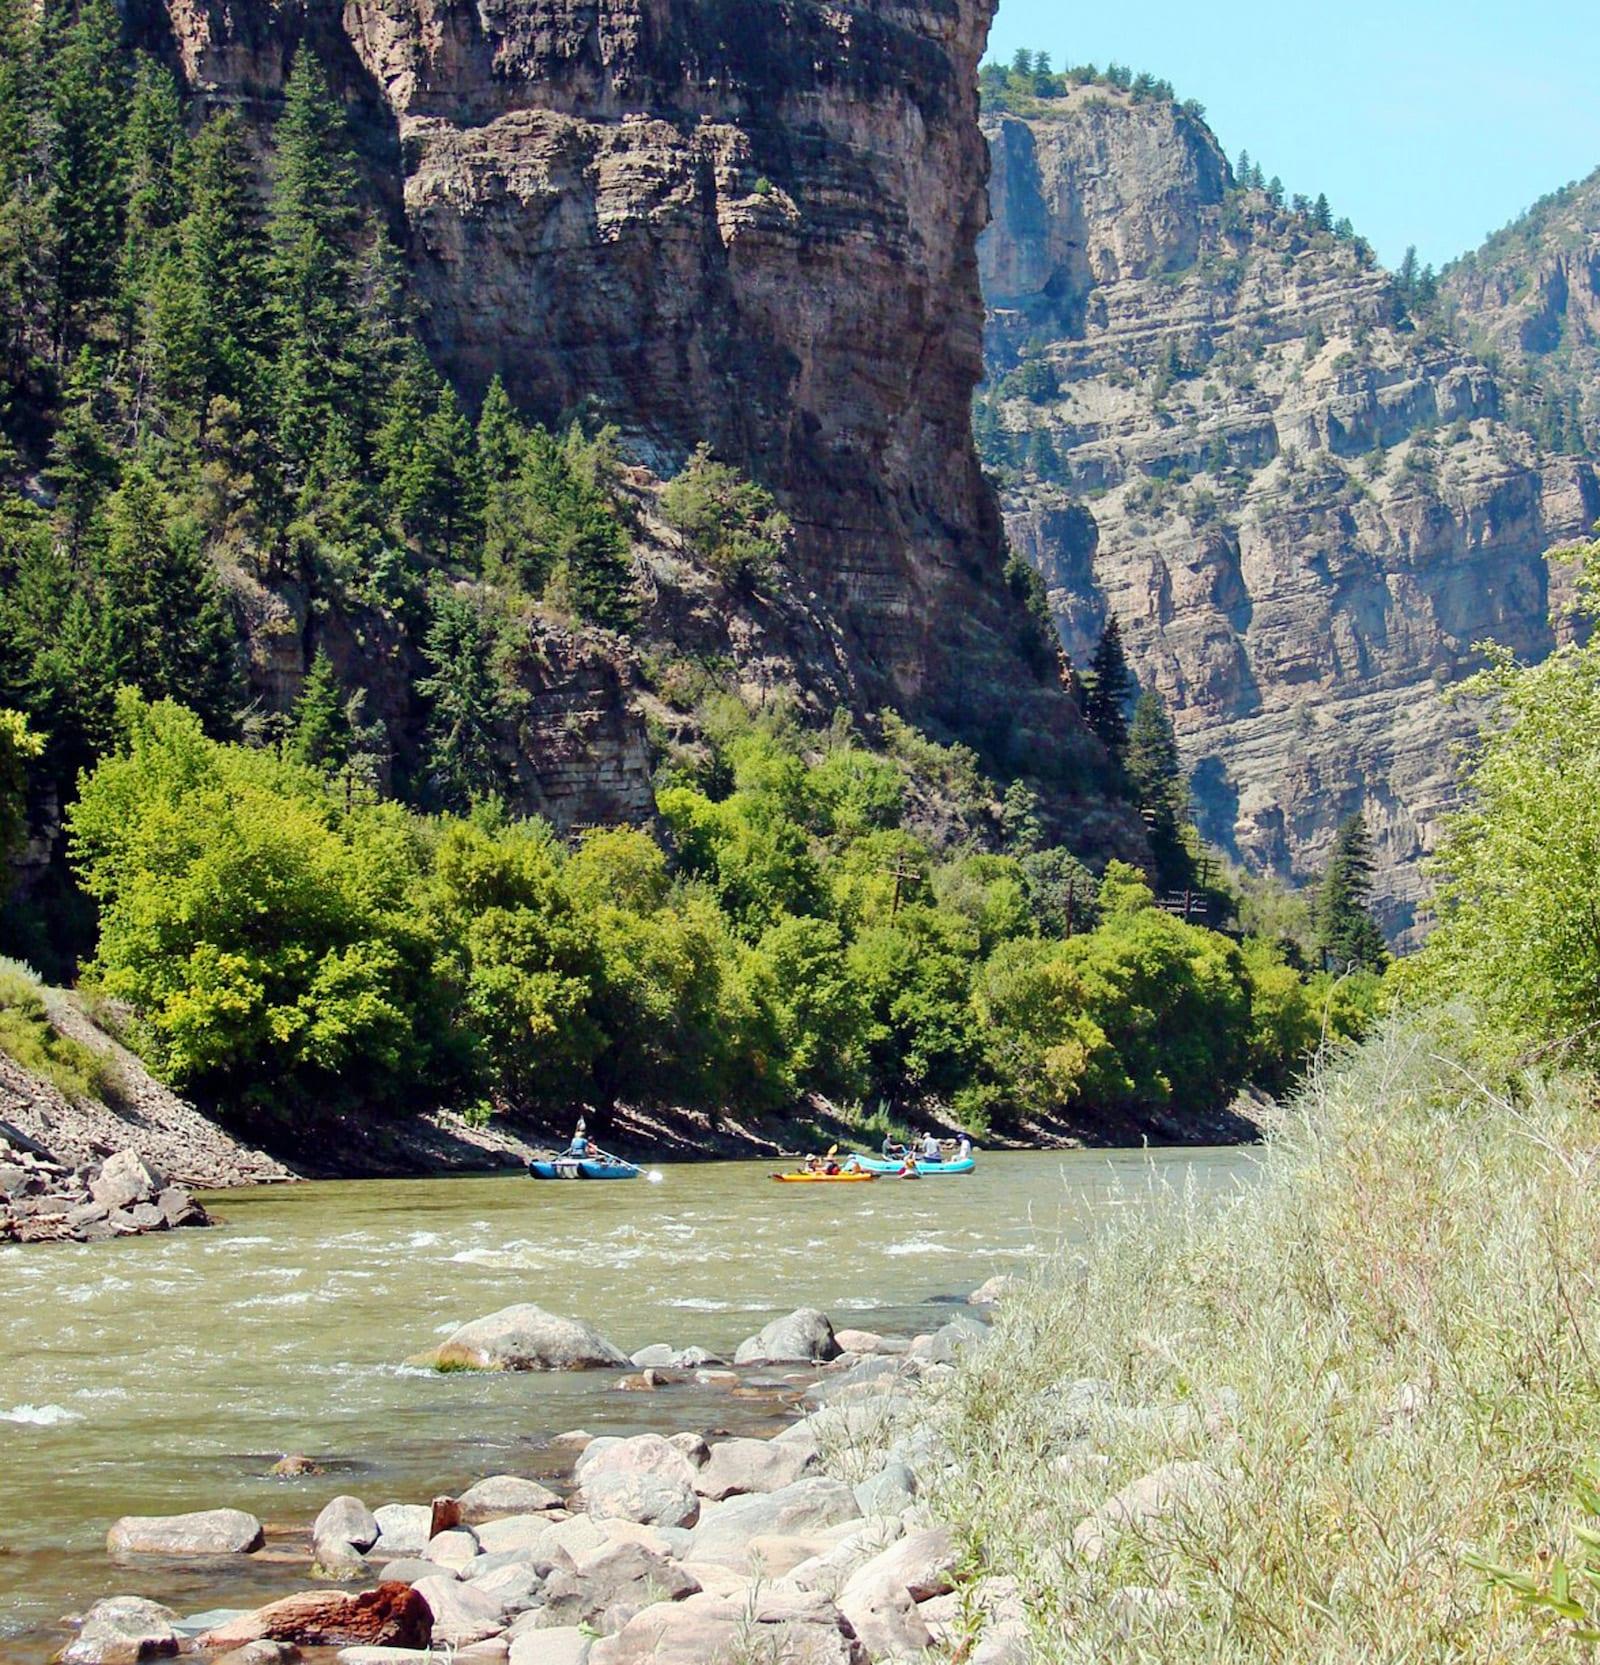 Rafting Upper Colorado River in Glenwood Canyon Colorado